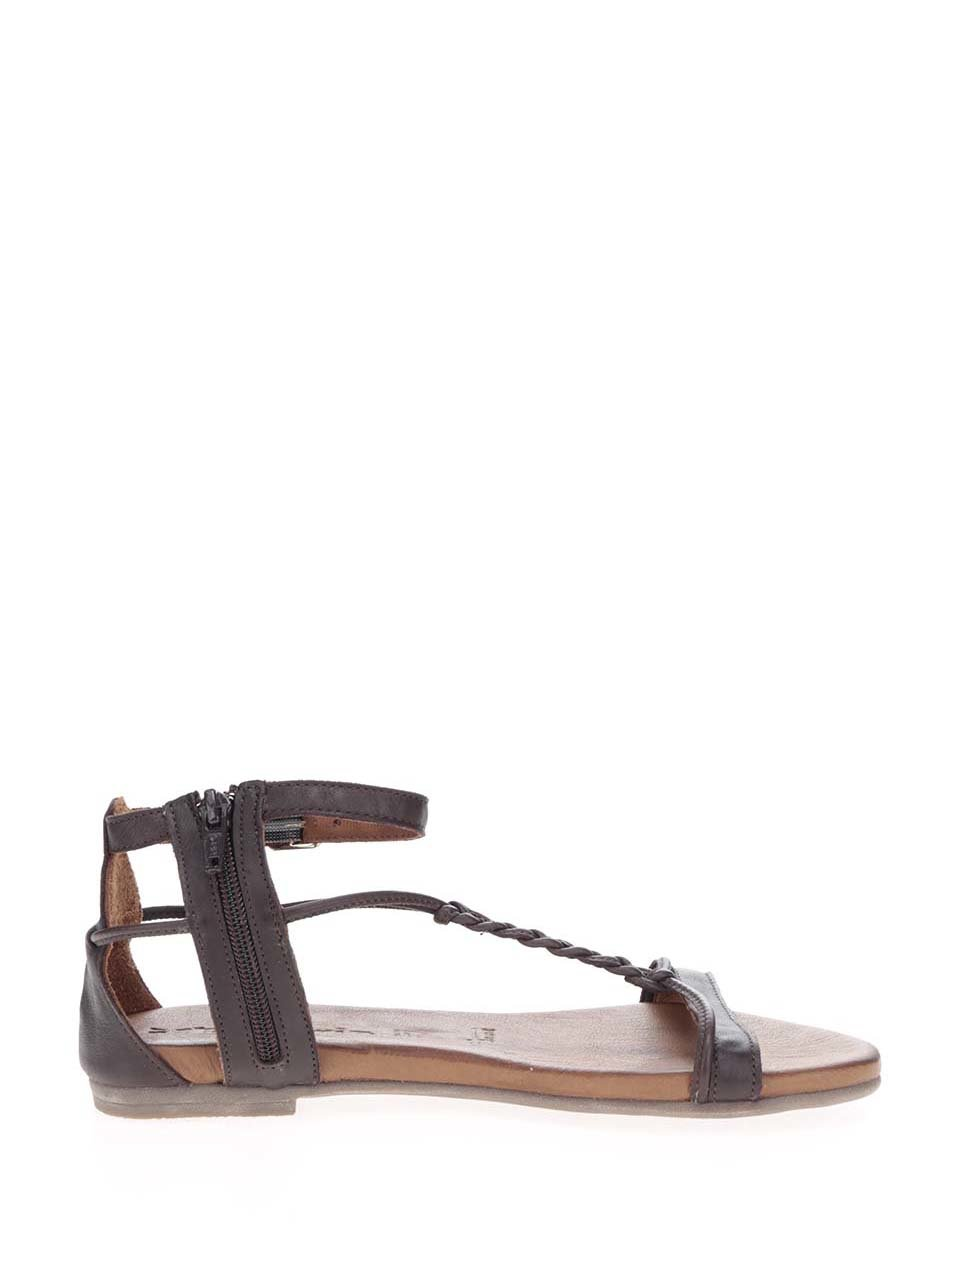 225b74fdc6cf Tmavohnedé kožené sandále Tamaris ...